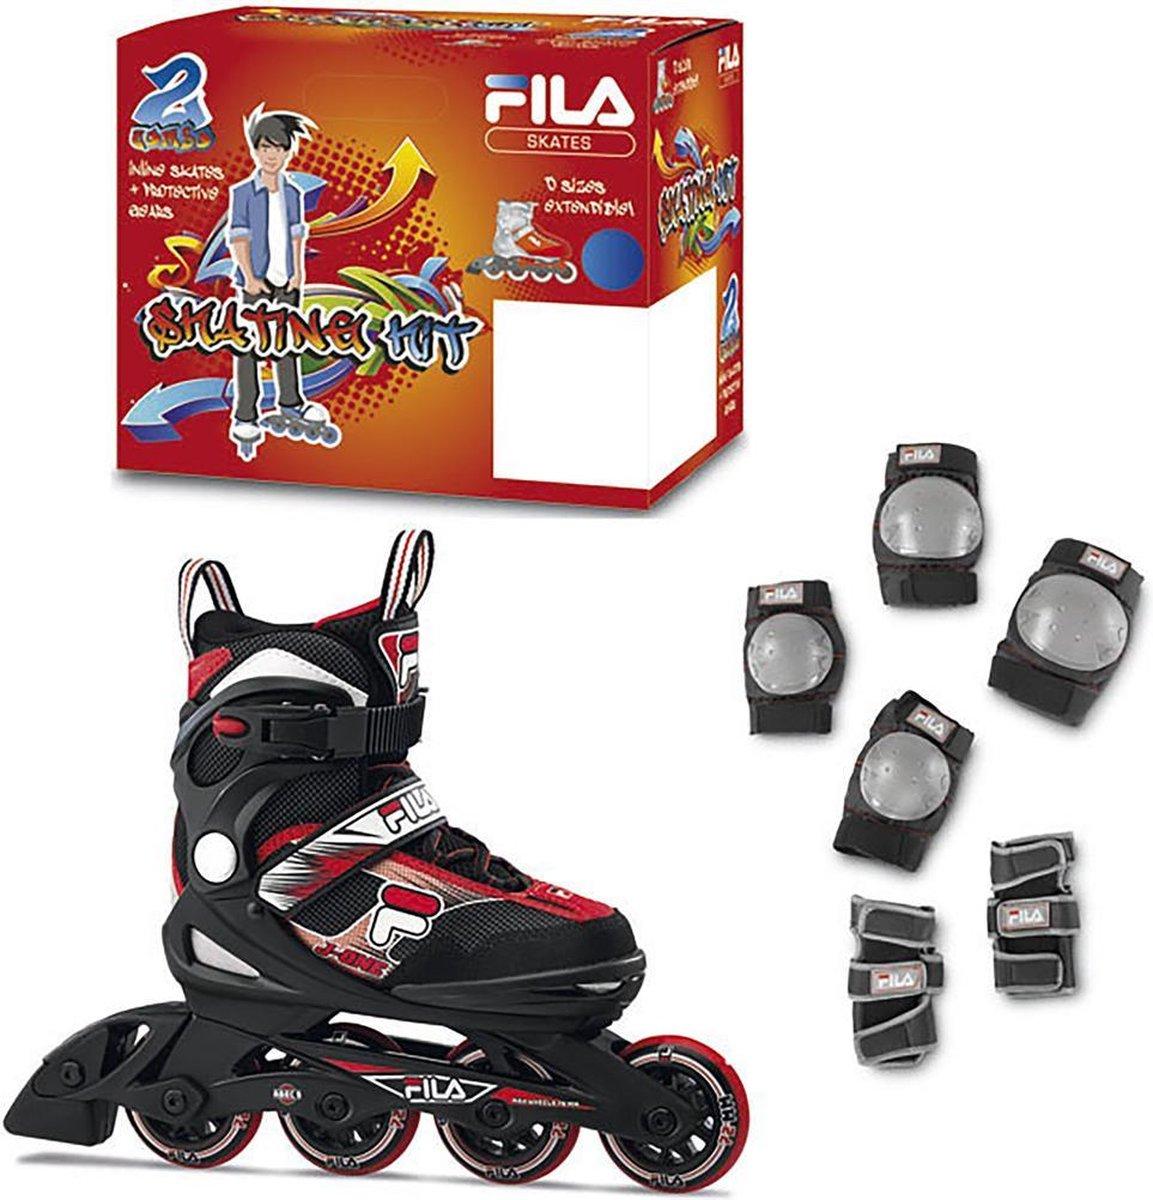 Fila Skates J-One Rood Maat 32-36 met Bescherming